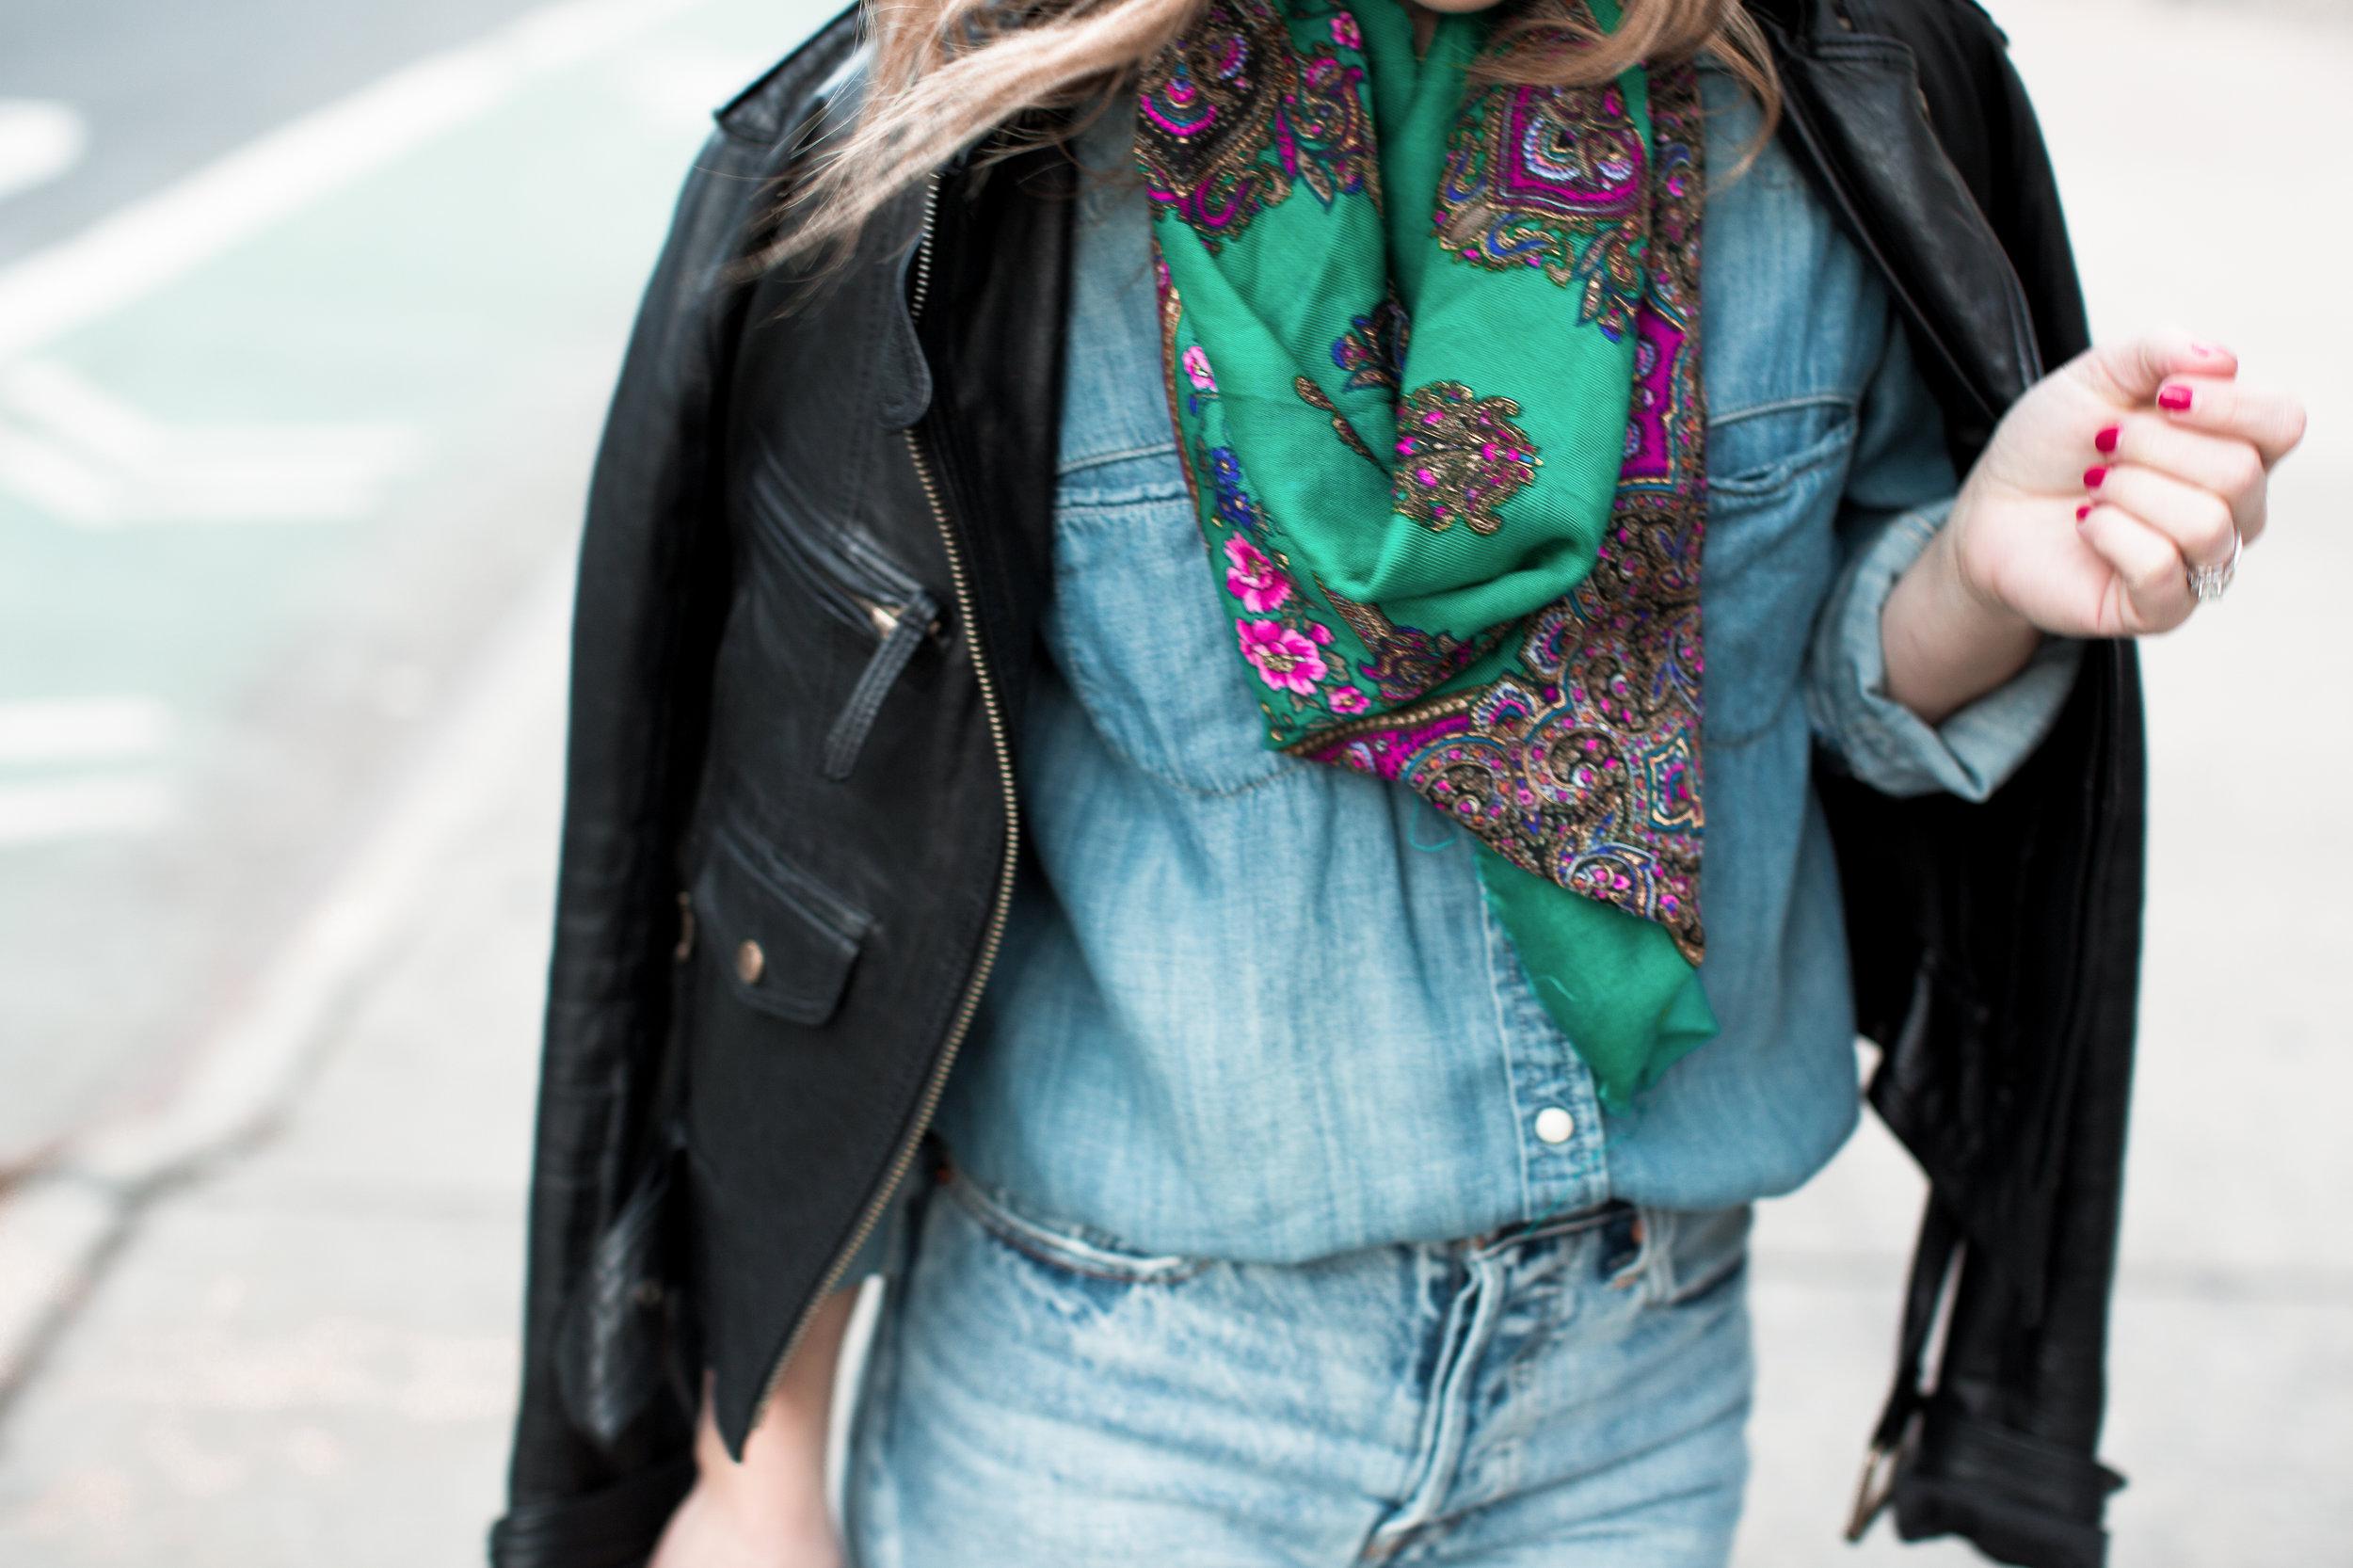 fizz-fade-green-vintage-scarf-22.jpg